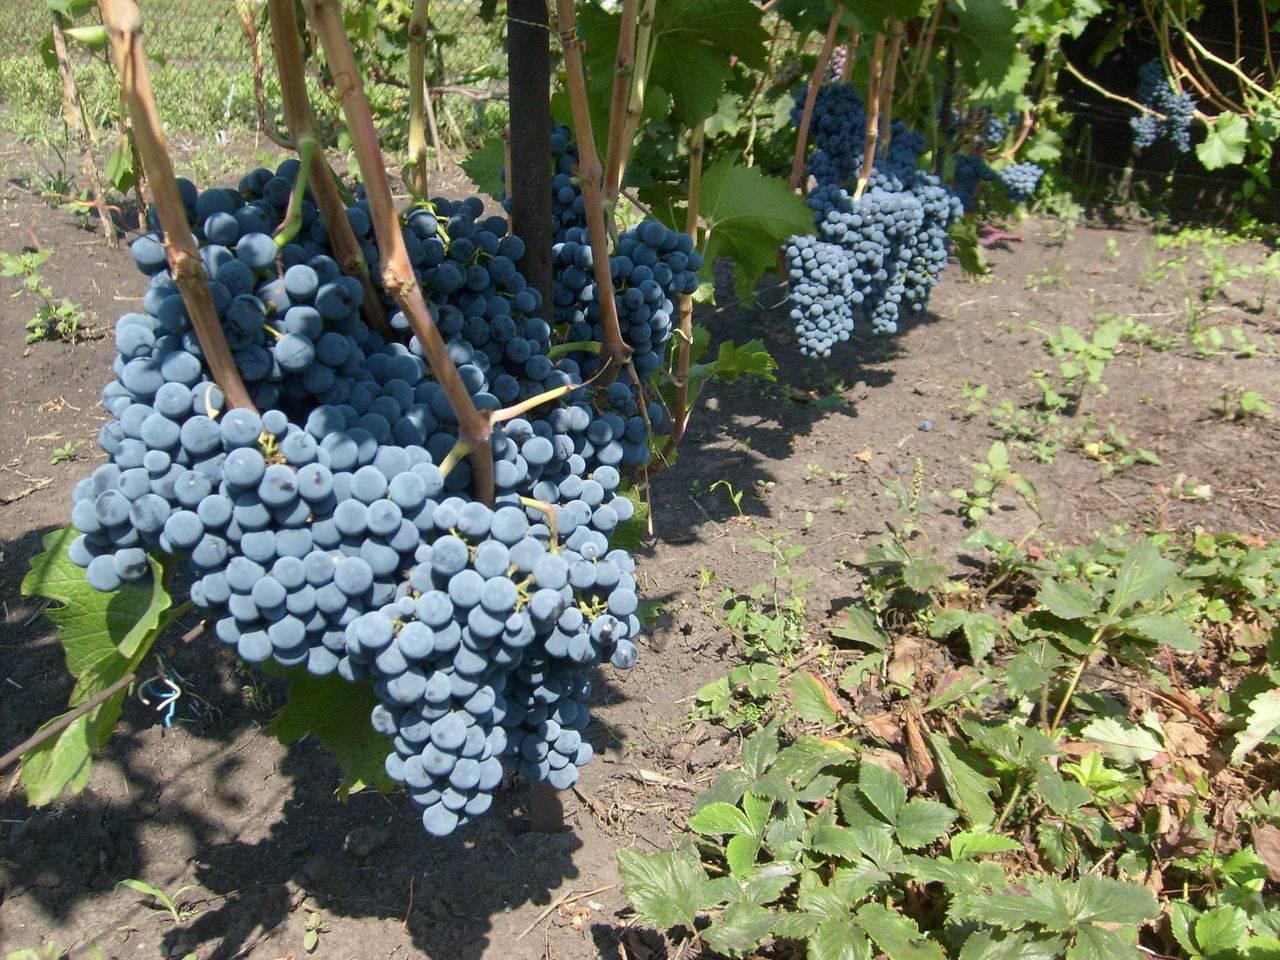 Посадка винограда в сибири для начинающих (с фото и видео)